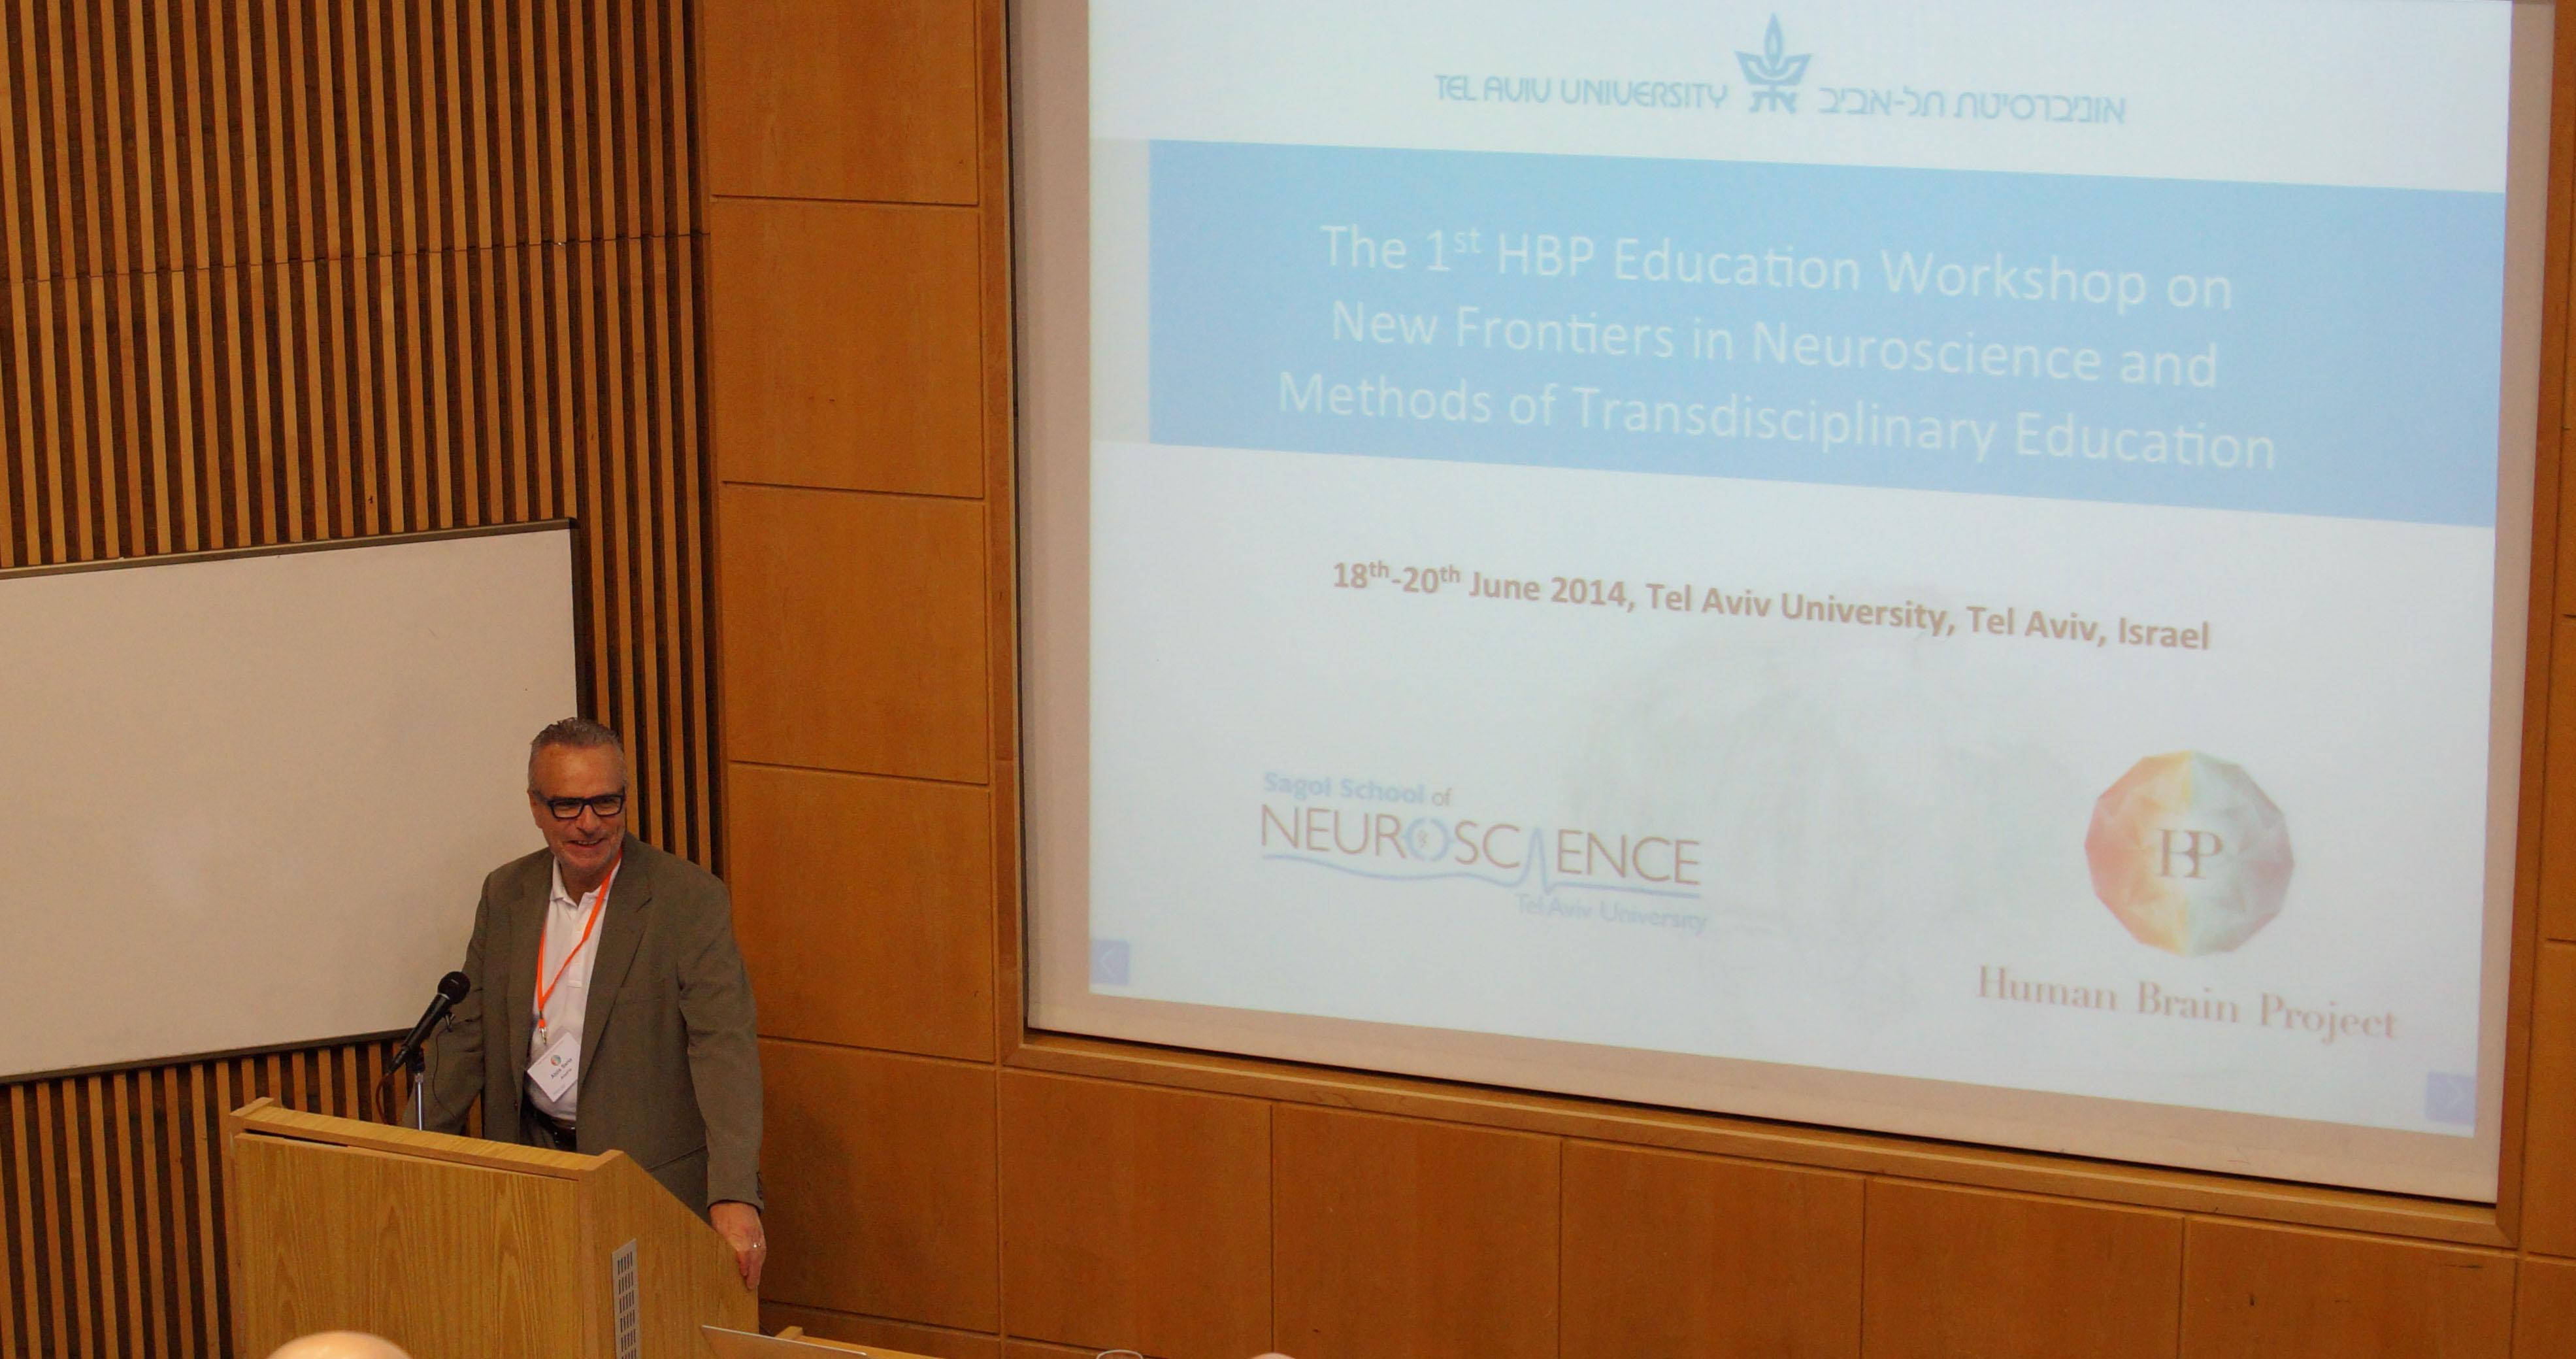 Opening session Prof. Saria -